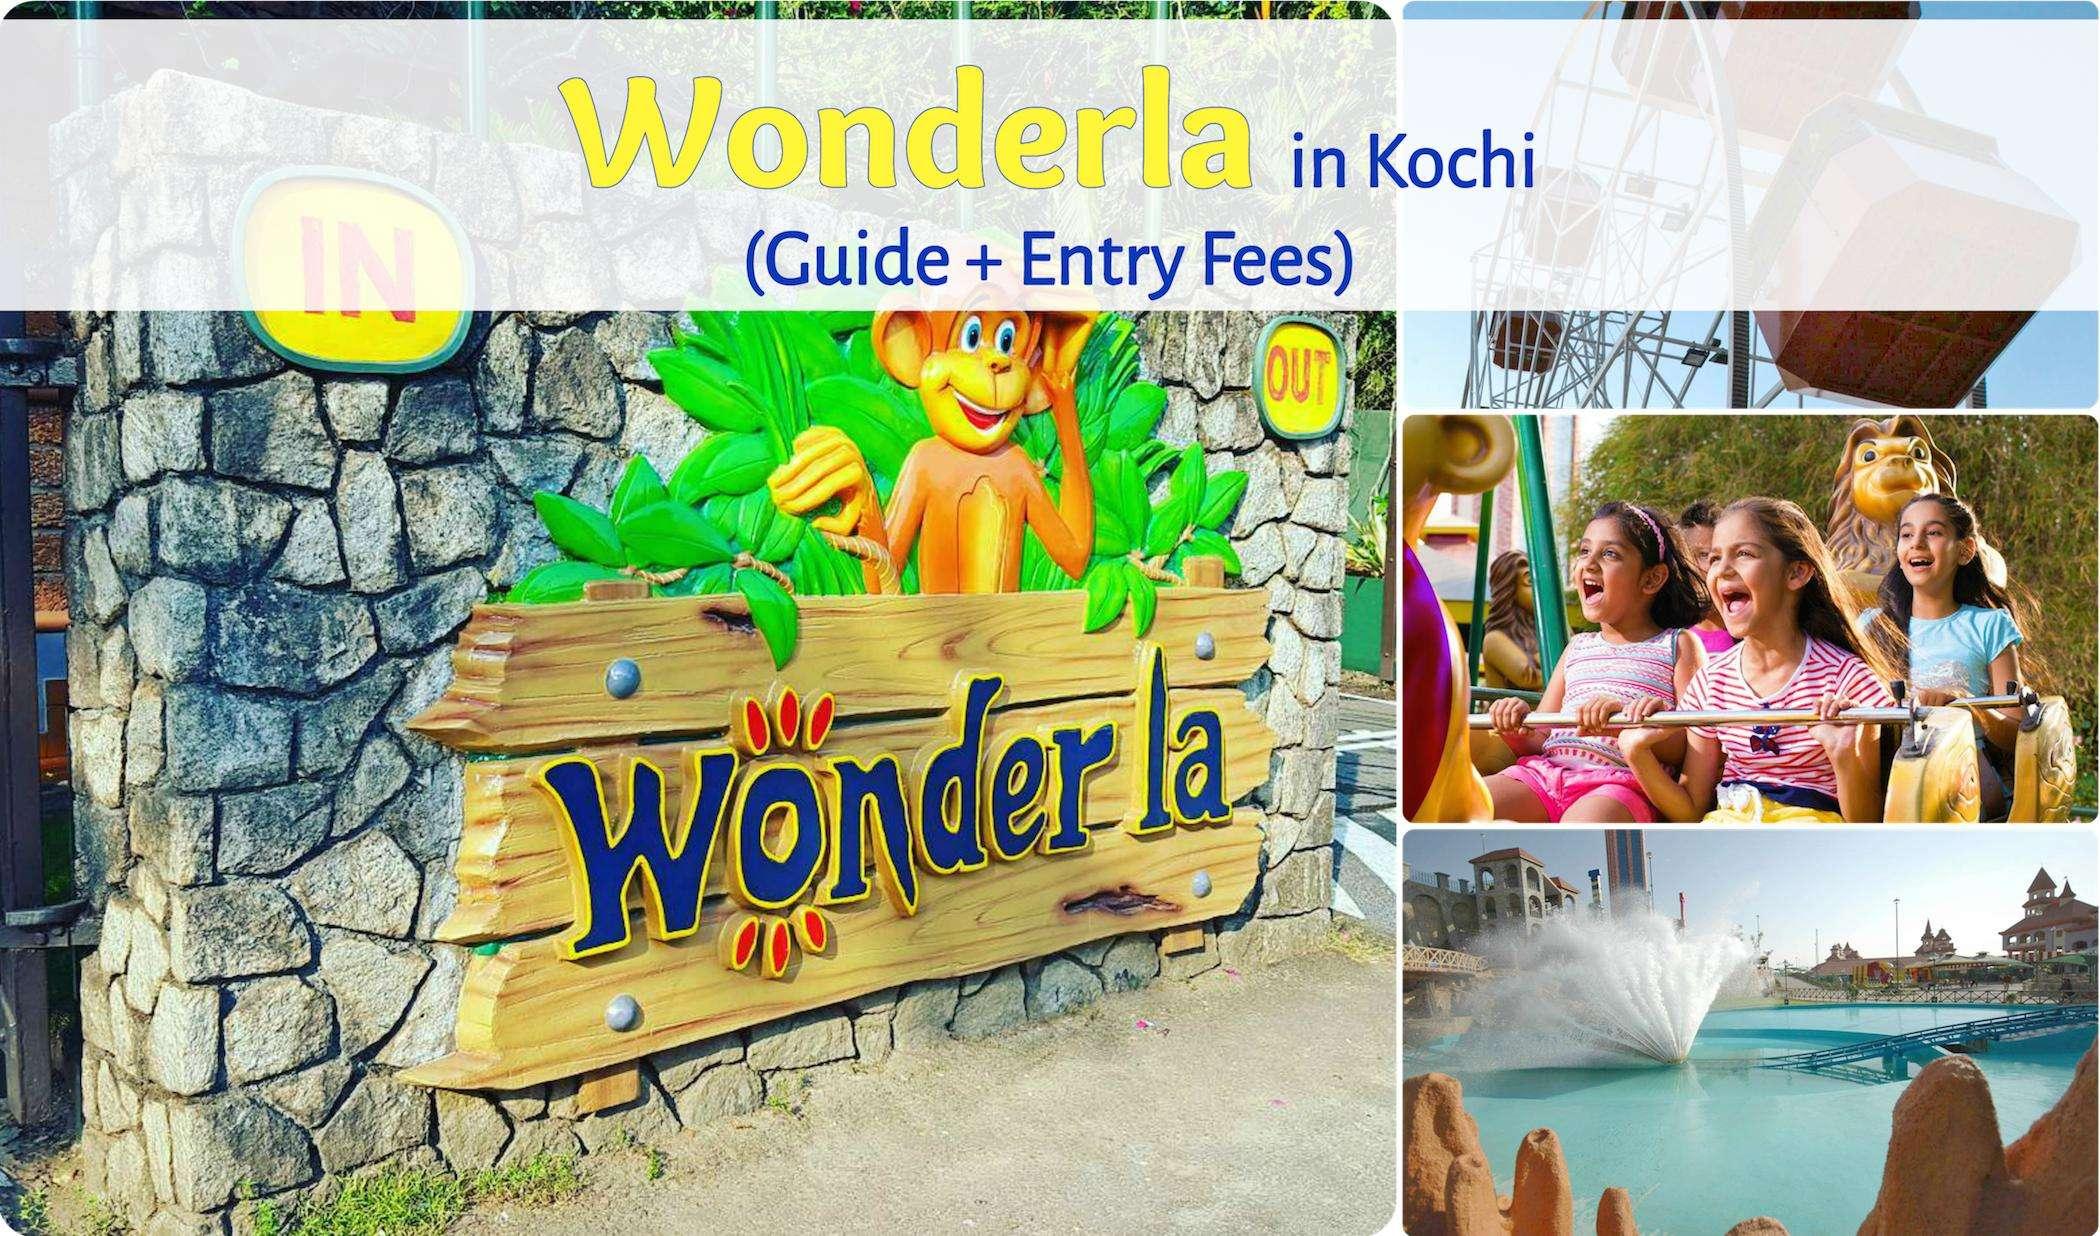 Wonderla-Veegaland-Amusement-Park-Kochi.jpg